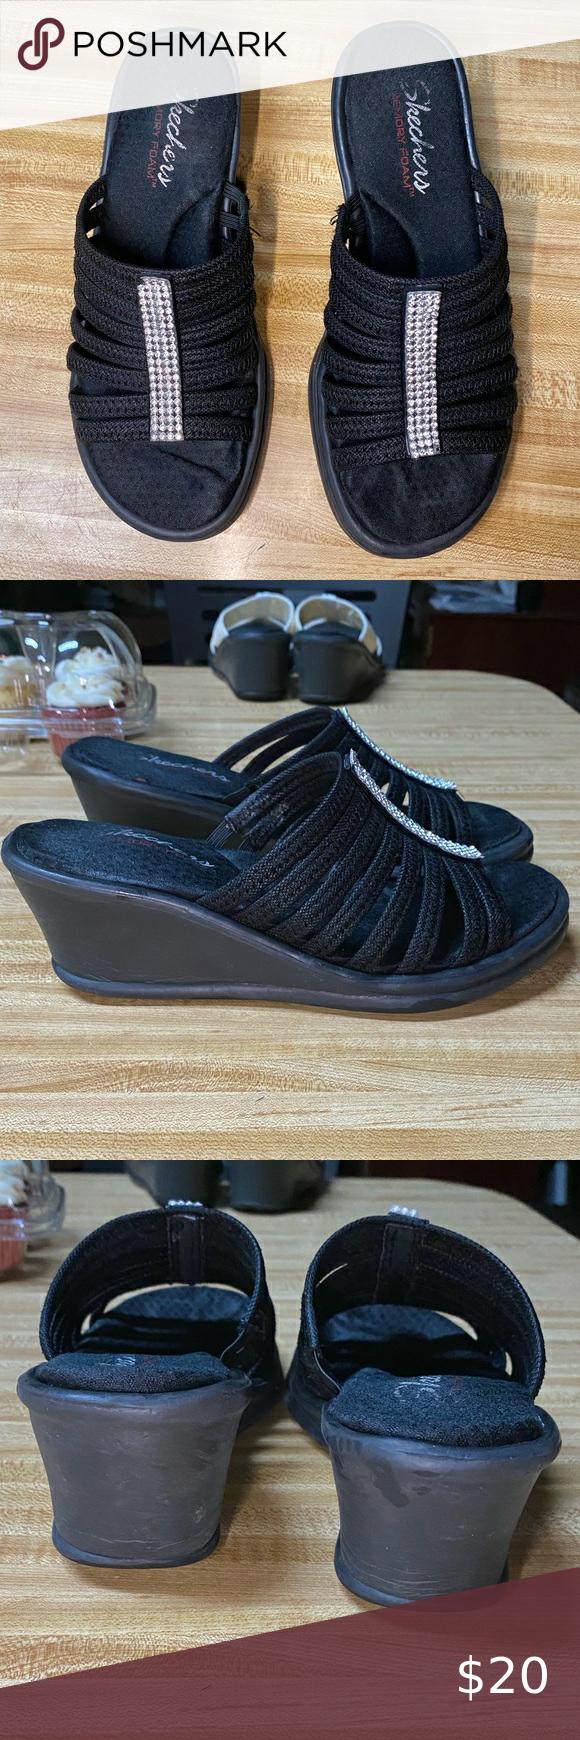 Skechers Rhinestone Wedge Sandals in